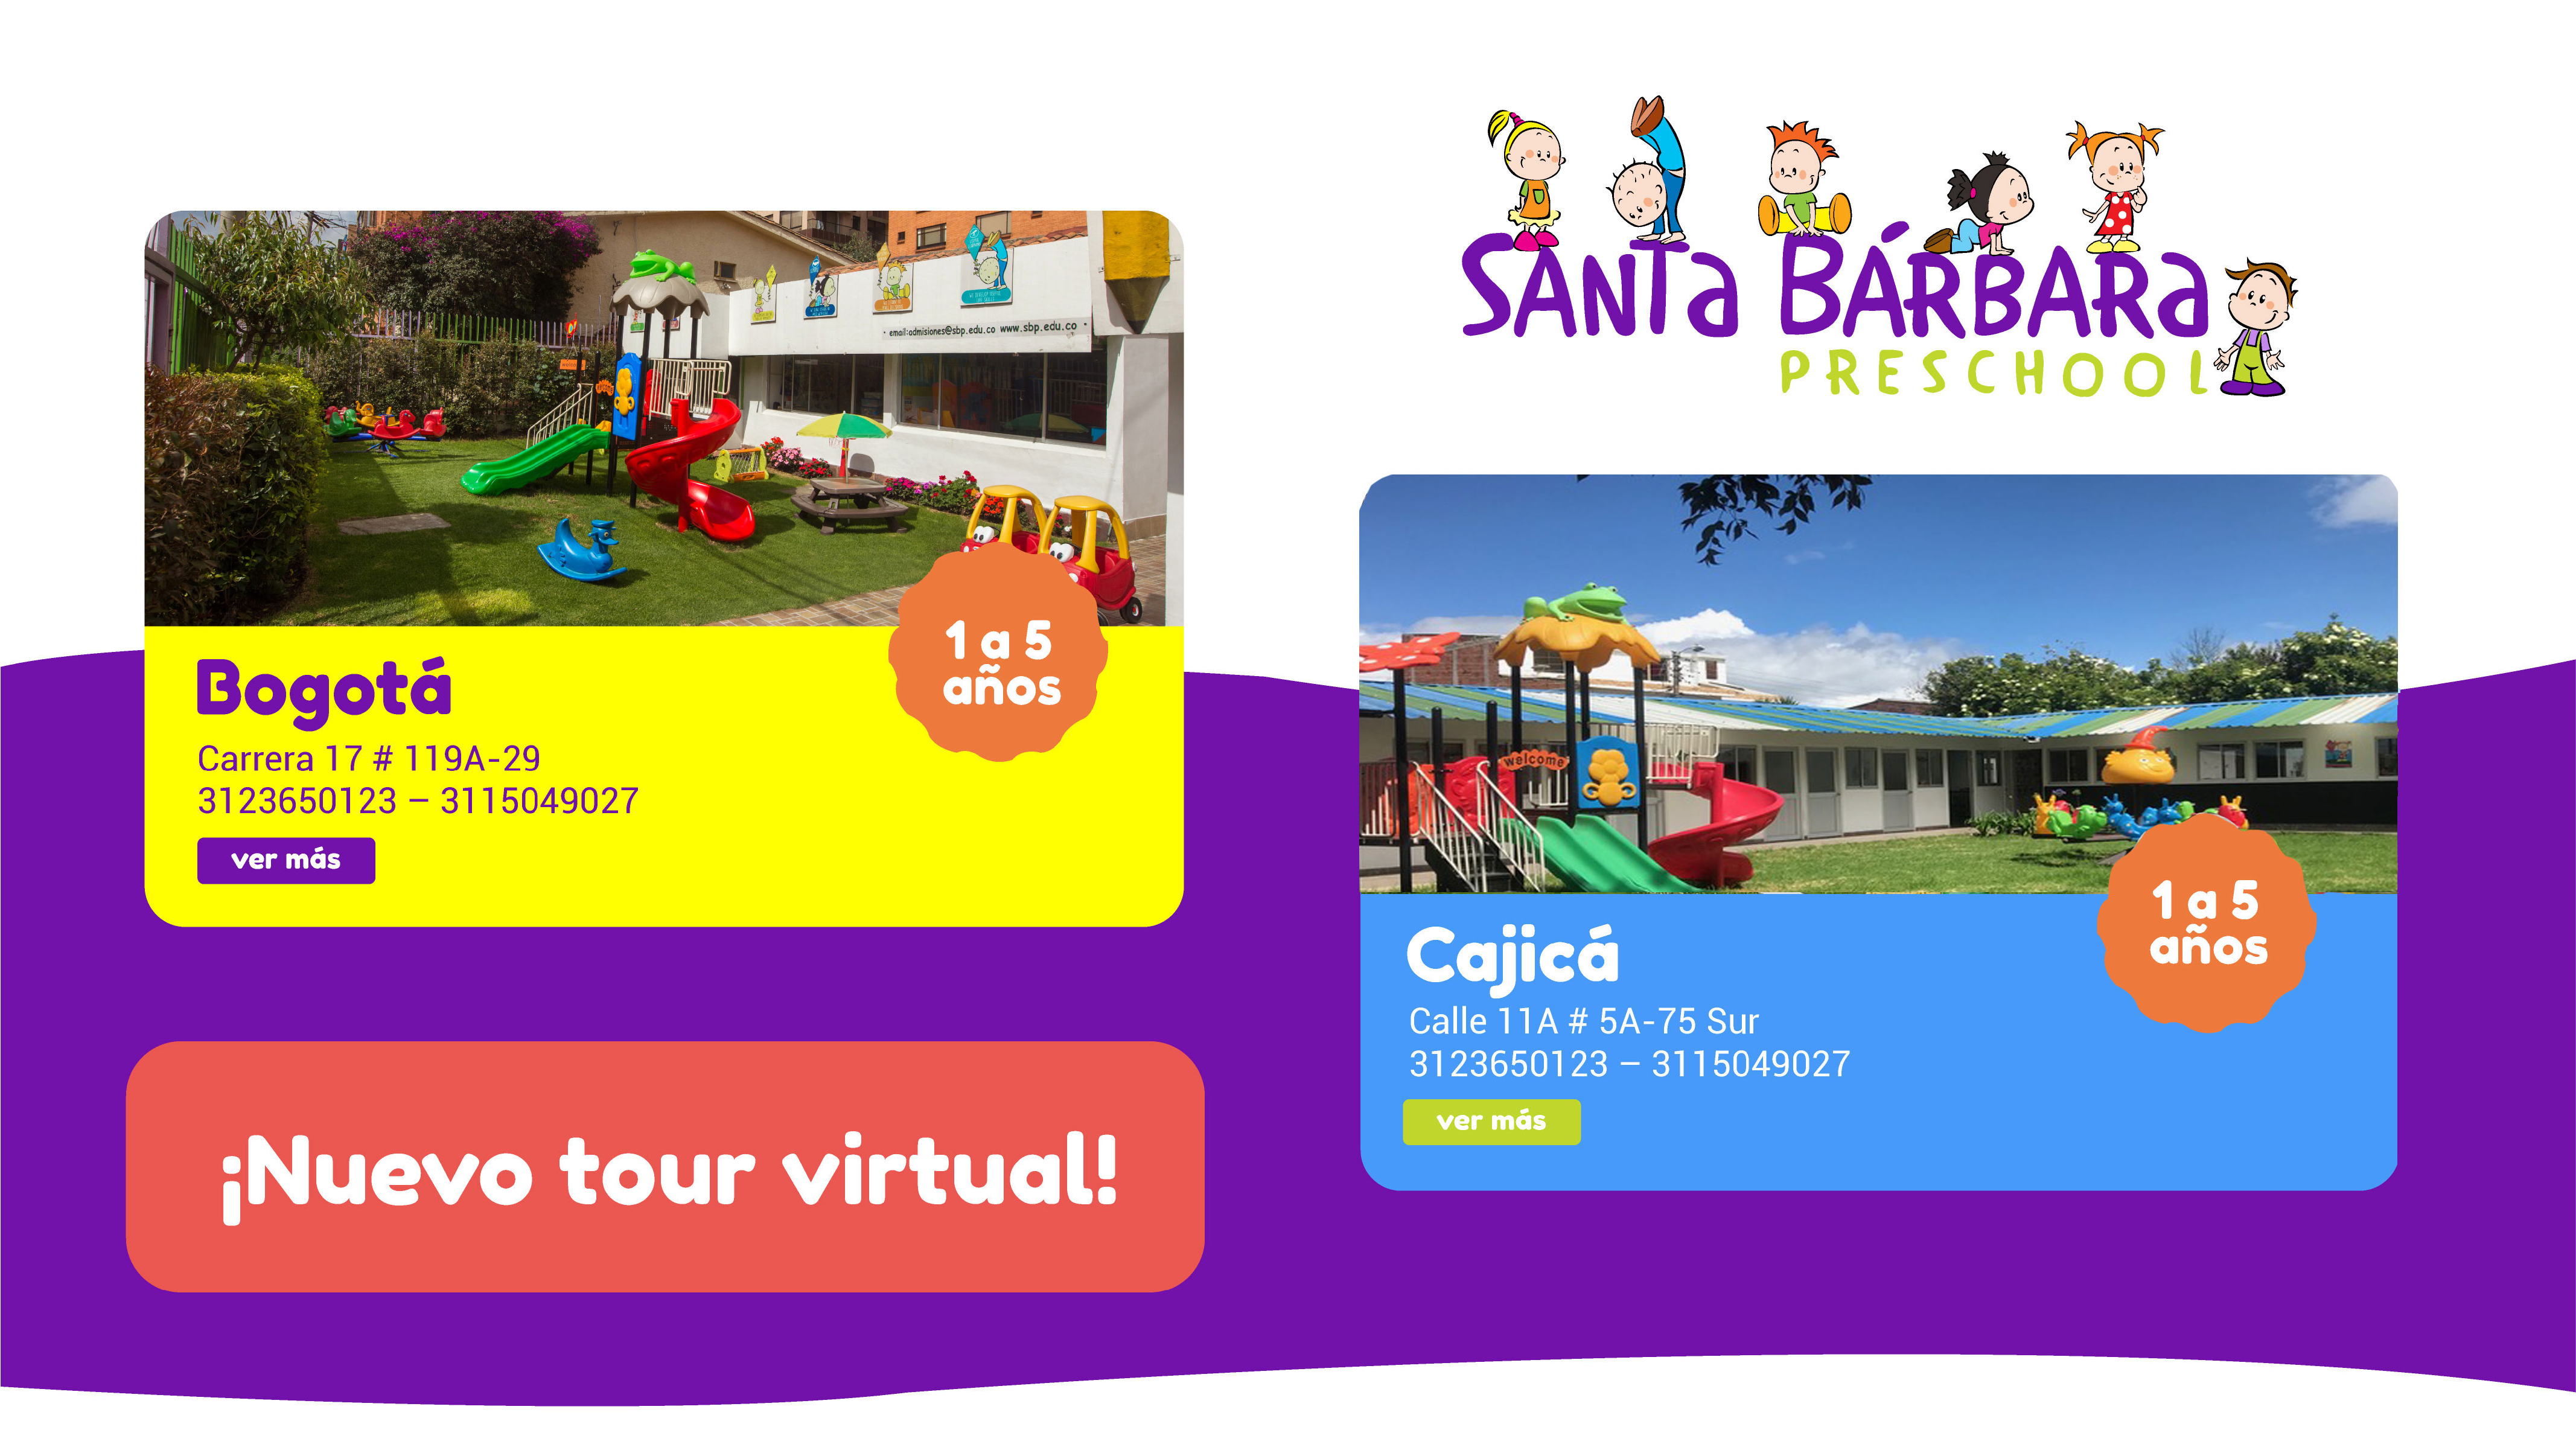 Santa-barbara-preschool-jardin-infantil-bogota-01